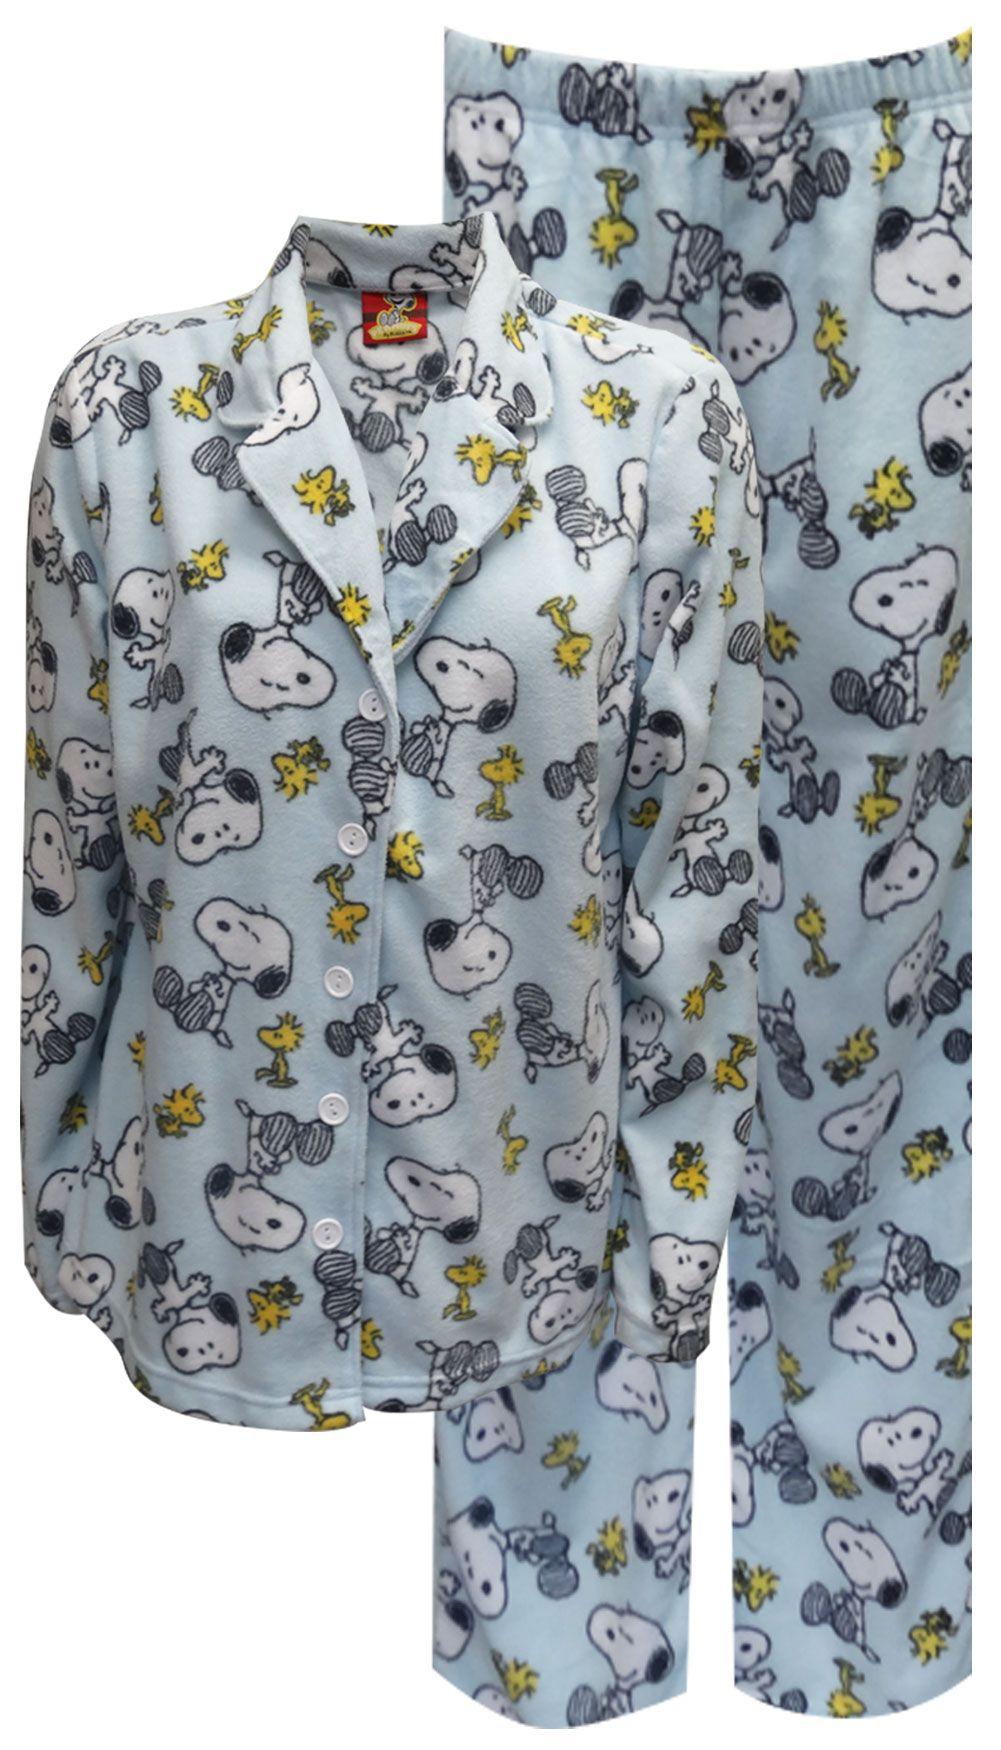 WebUndies.com Peanuts Snoopy and Woodstock Light Blue Plush Pajama I have ones like these and I love them